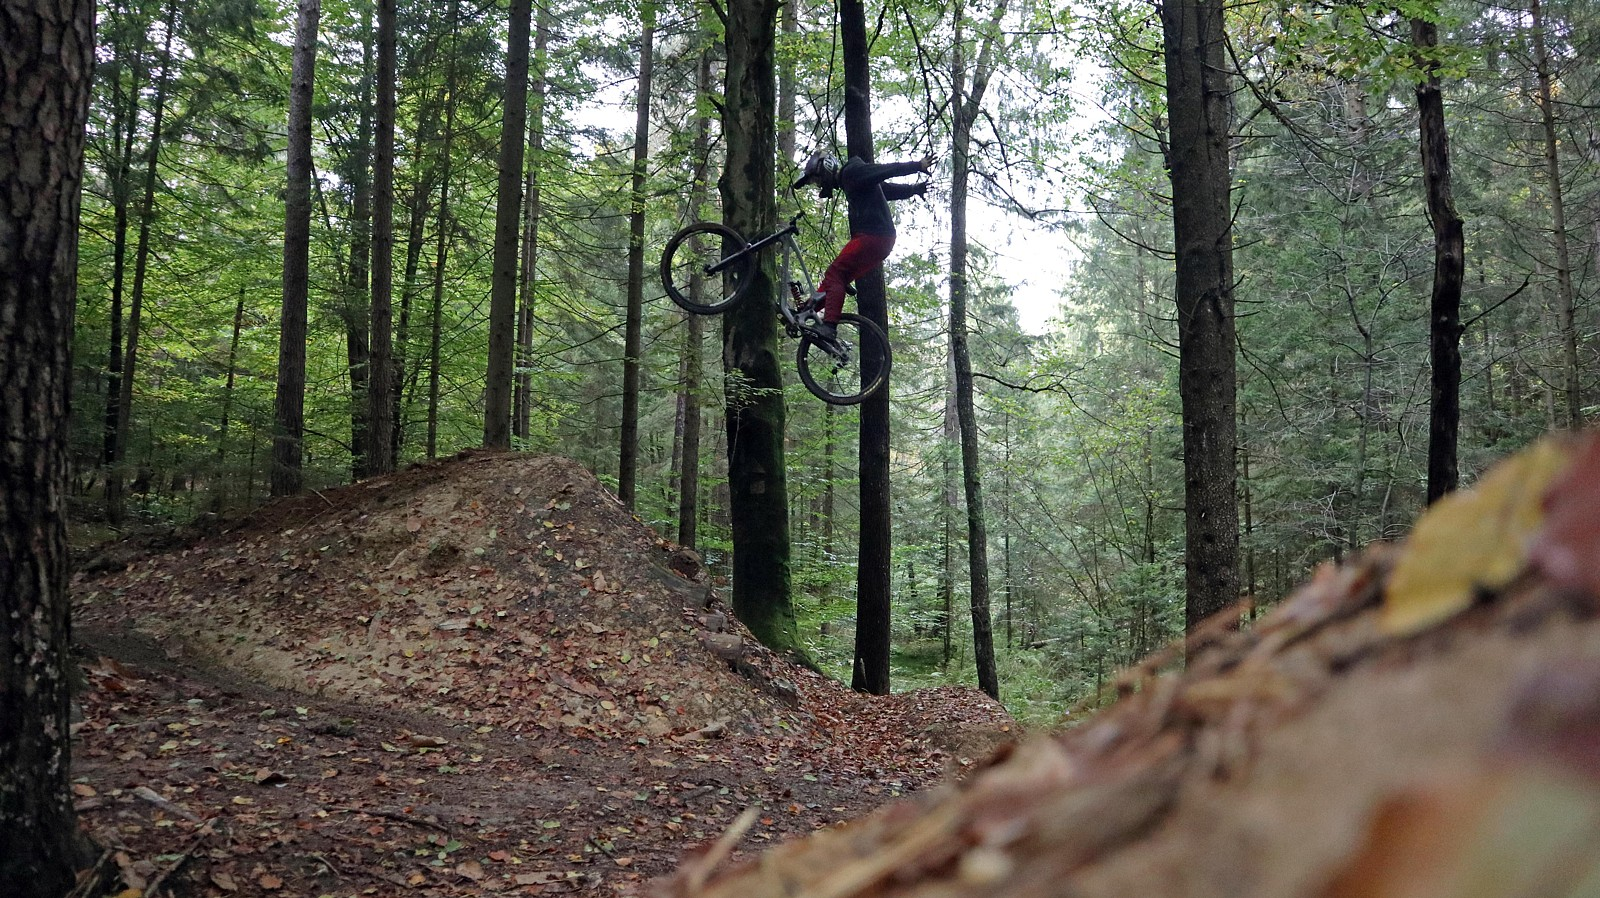 jan jp step up photo porsonmedia 1 - porson - Mountain Biking Pictures - Vital MTB